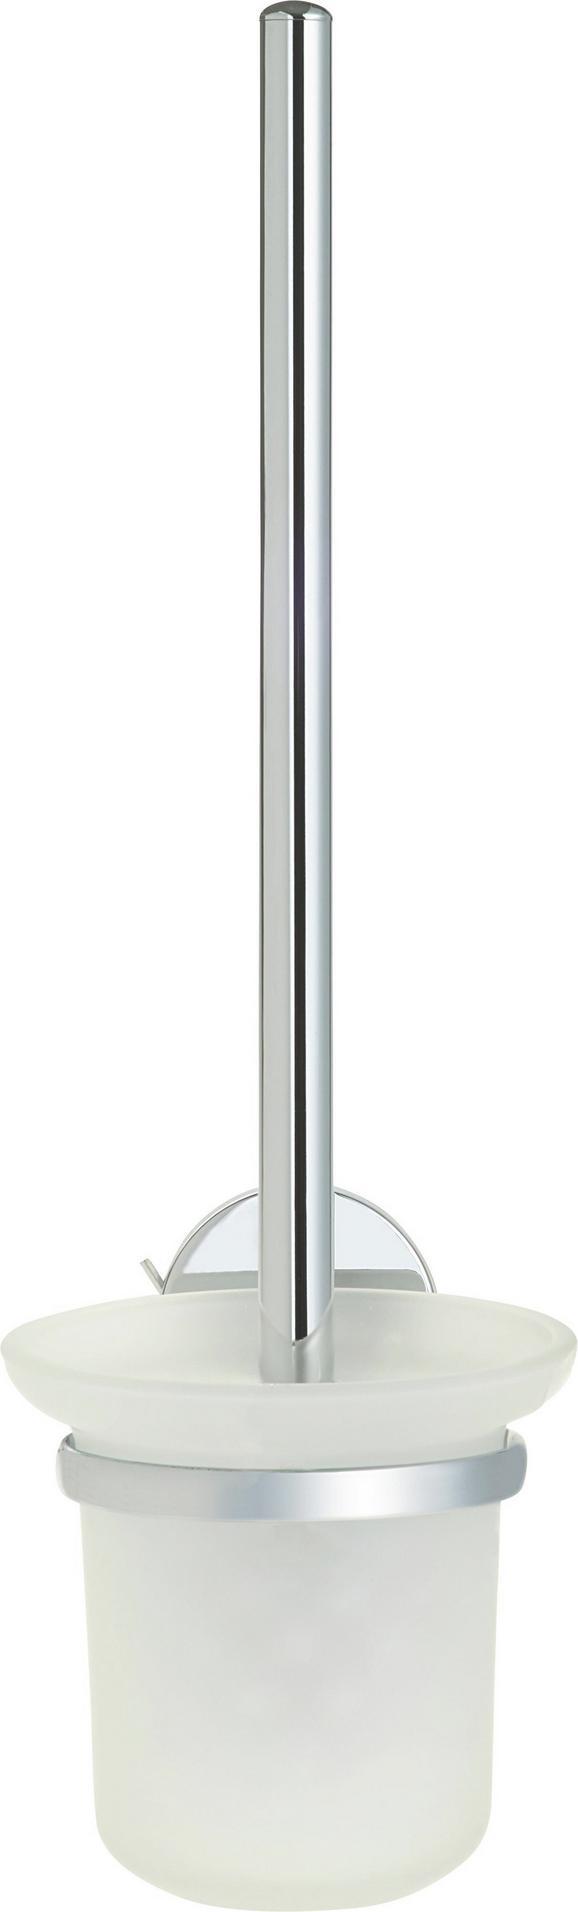 WC-Bürstengarnitur Vision Chromfarben - Chromfarben, Glas/Kunststoff (11/38/15cm) - Mömax modern living